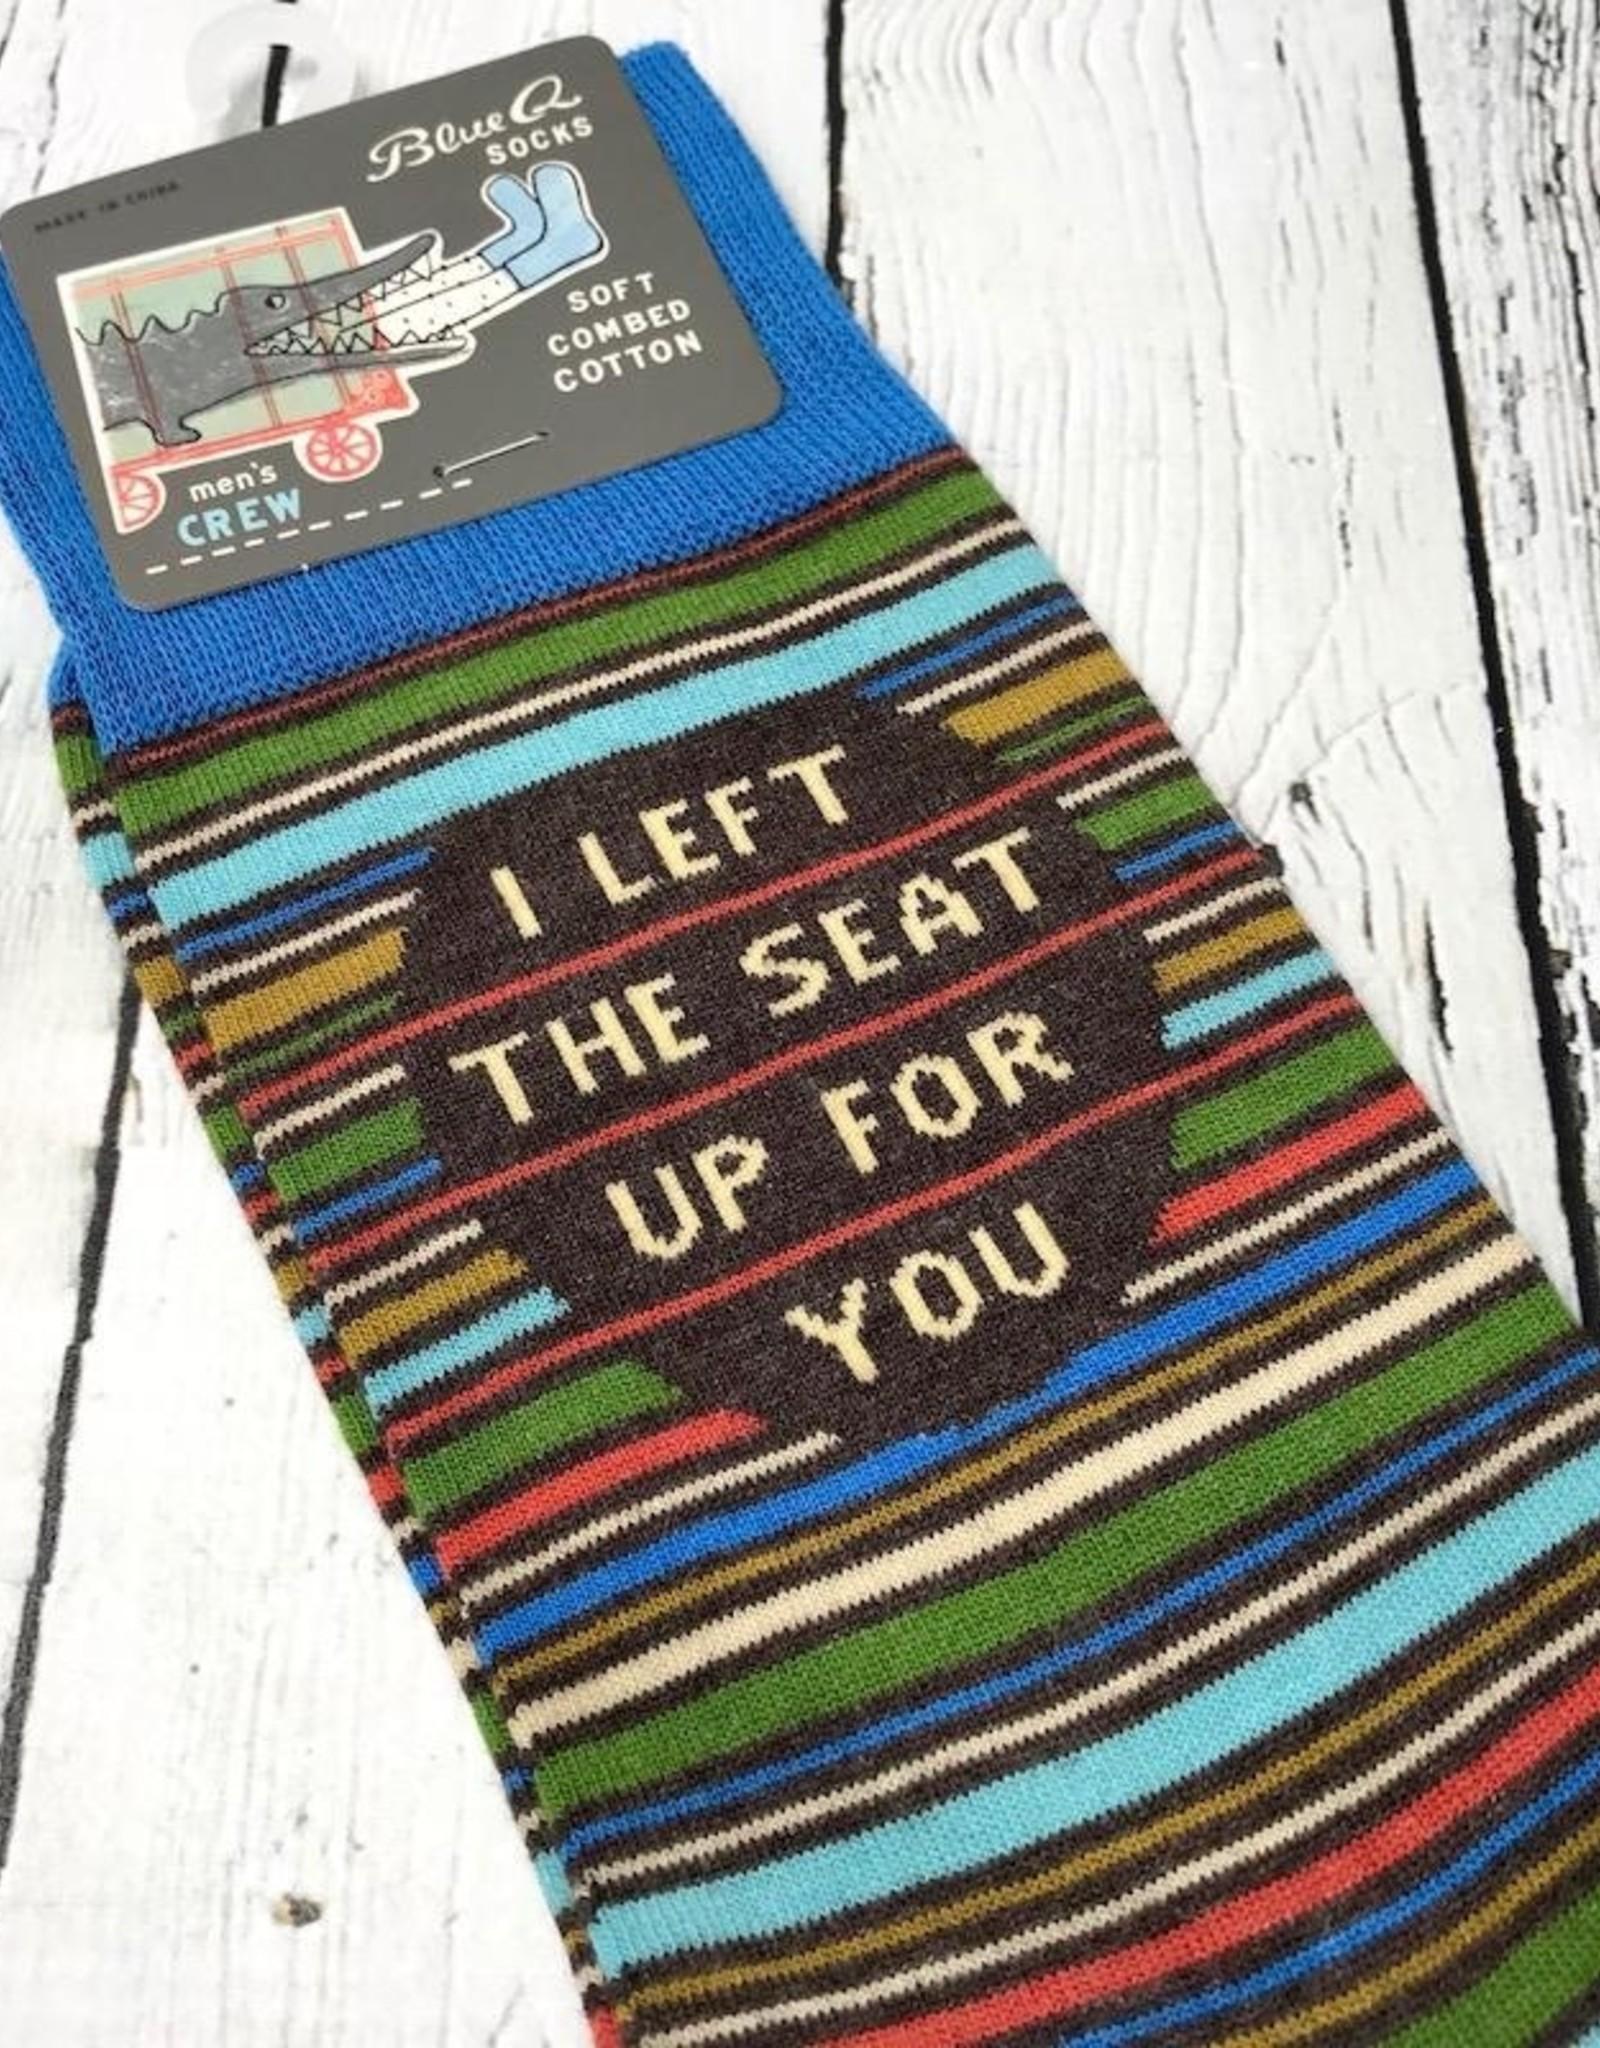 BlueQ I Left The Seat Up Men's Crew Socks